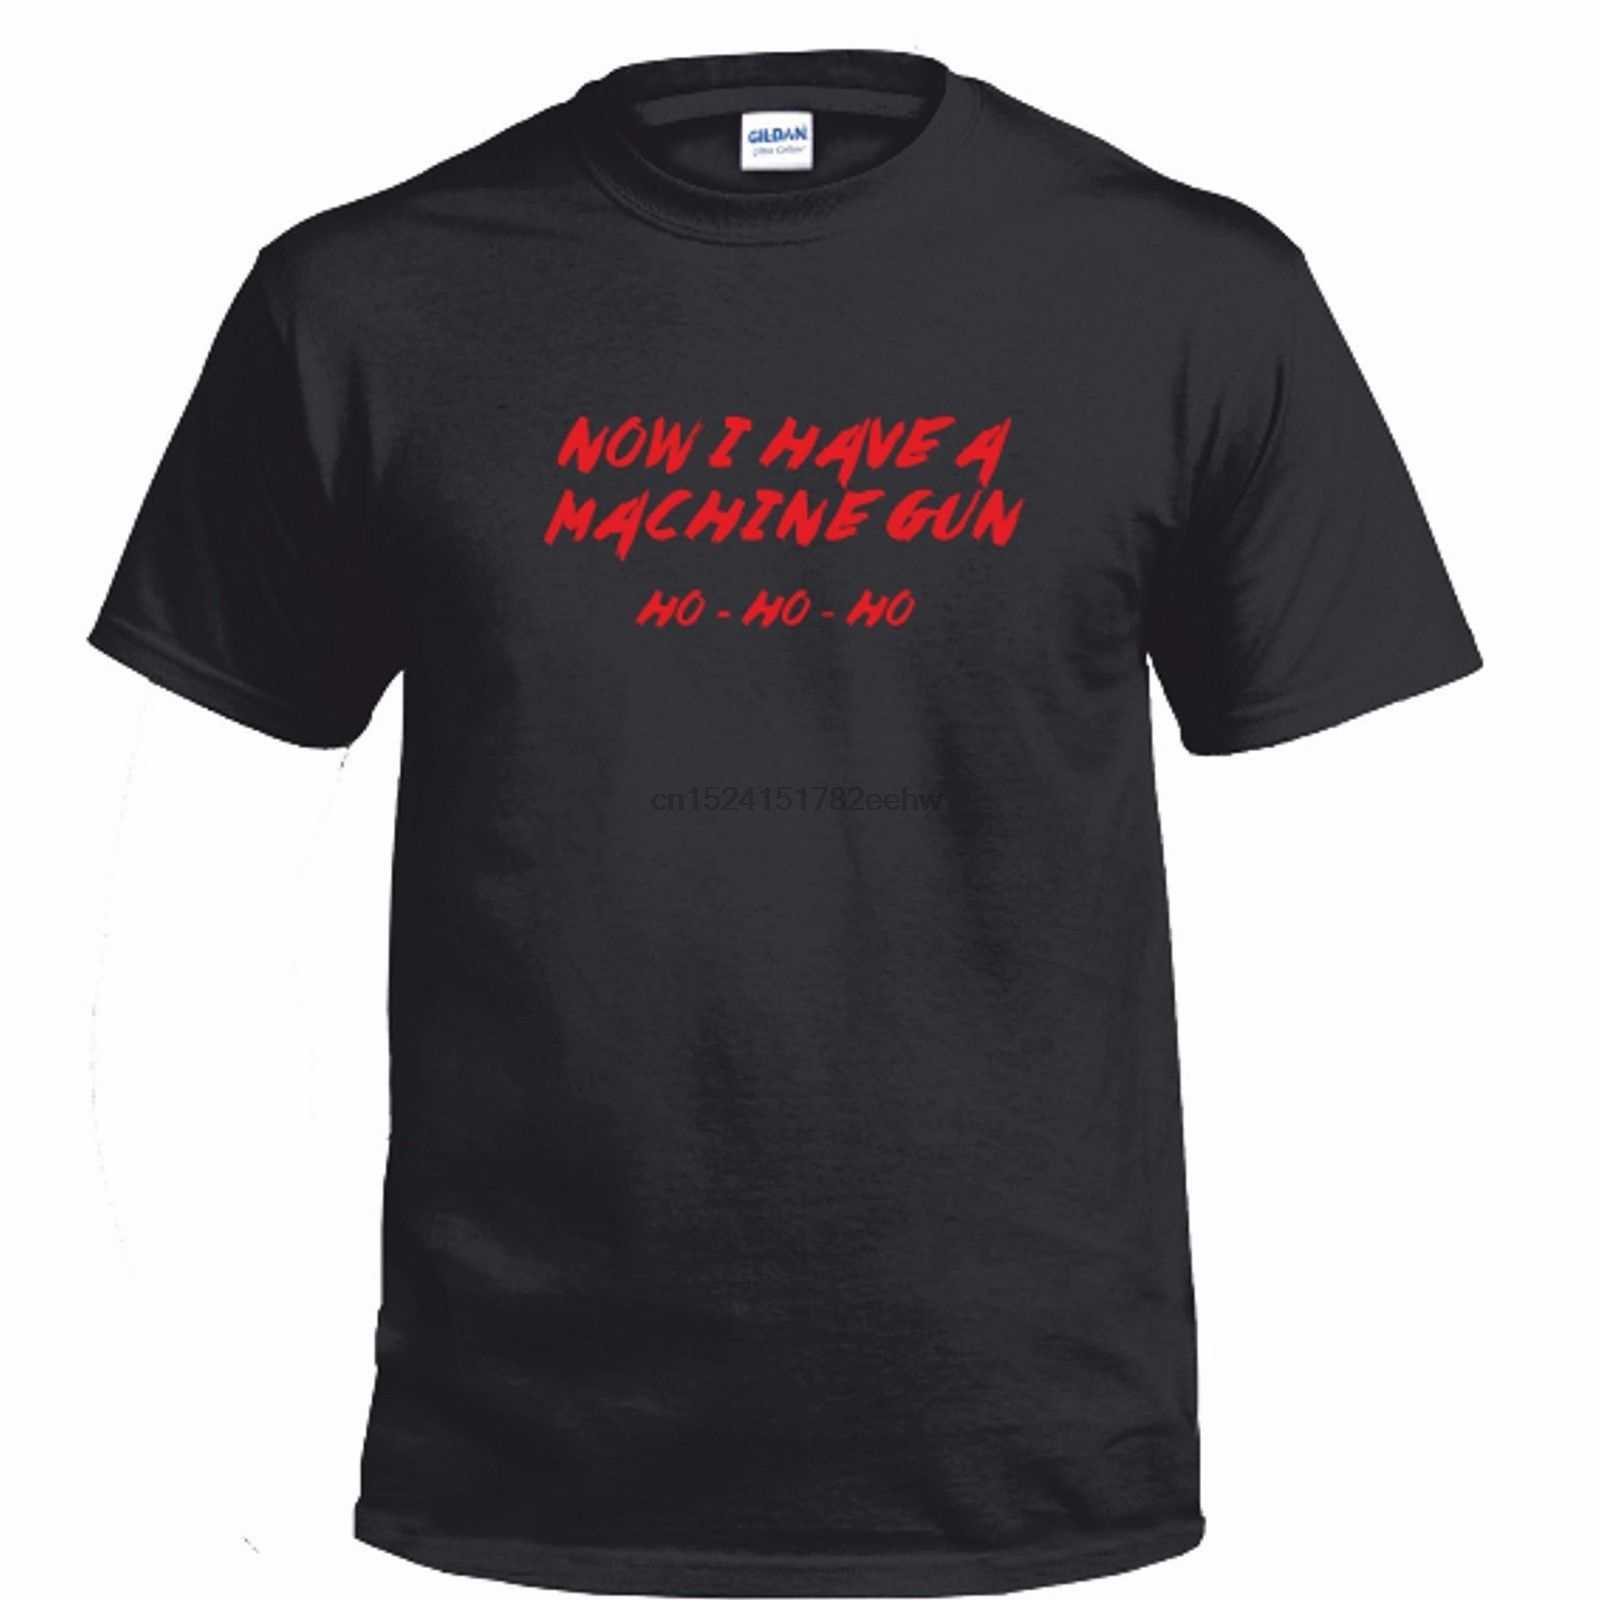 Мужская футболка с надписью «DIE HARD»-Now I Have A Machine Gun-Рождественская футболка Брюса Уиллиса